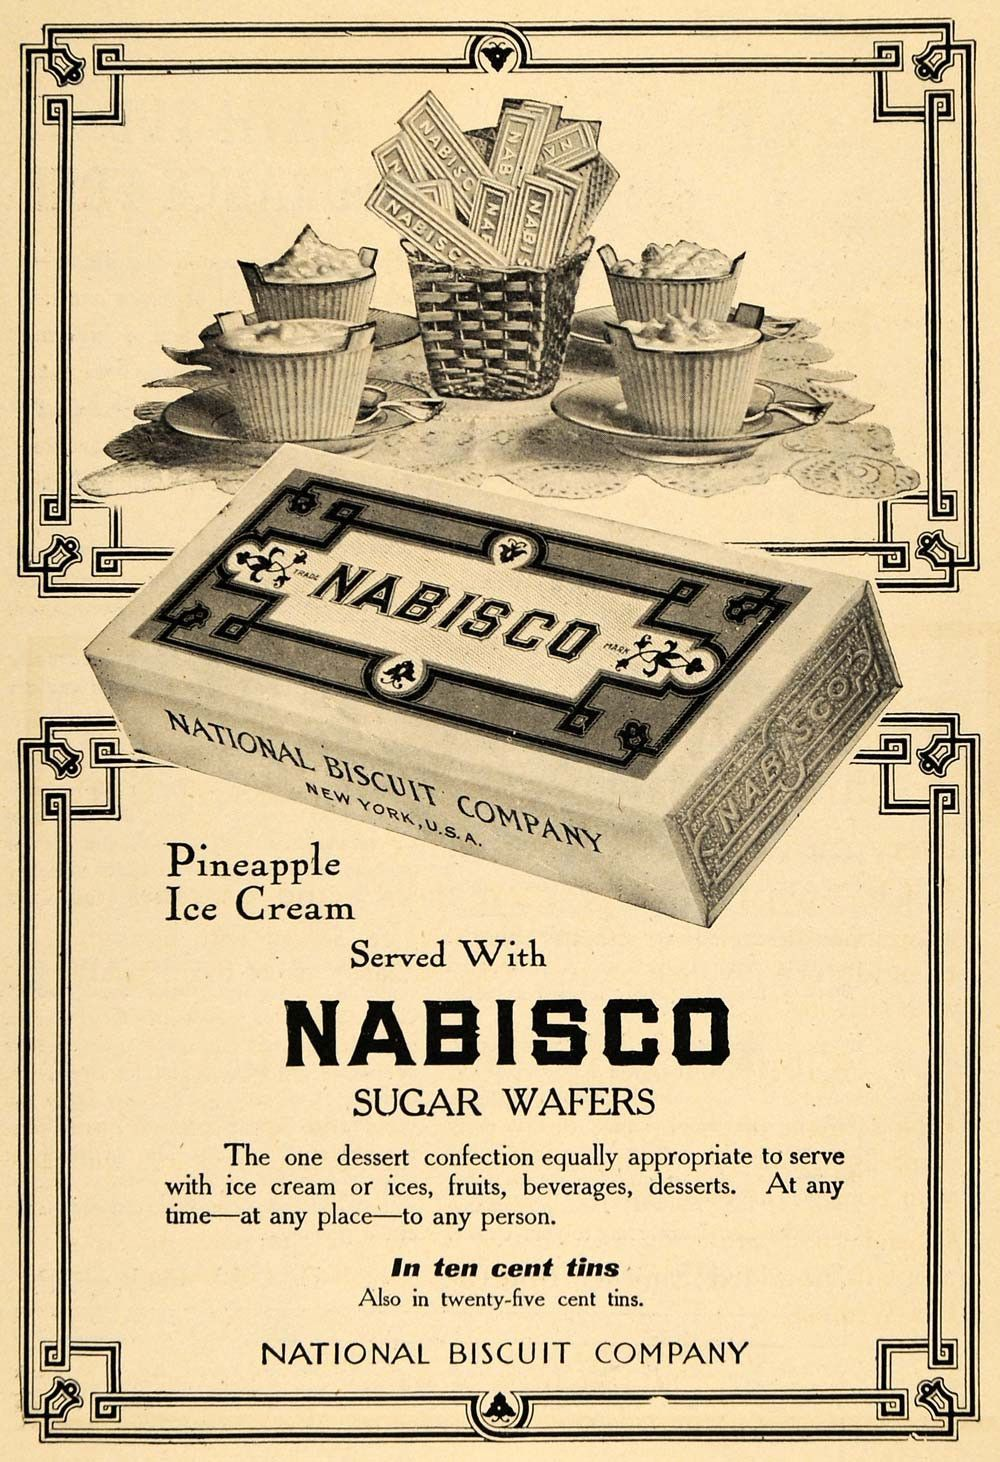 1909 Ad Nabisco Sugar Wafers Dessert National Biscuit - ORIGINAL TOM3